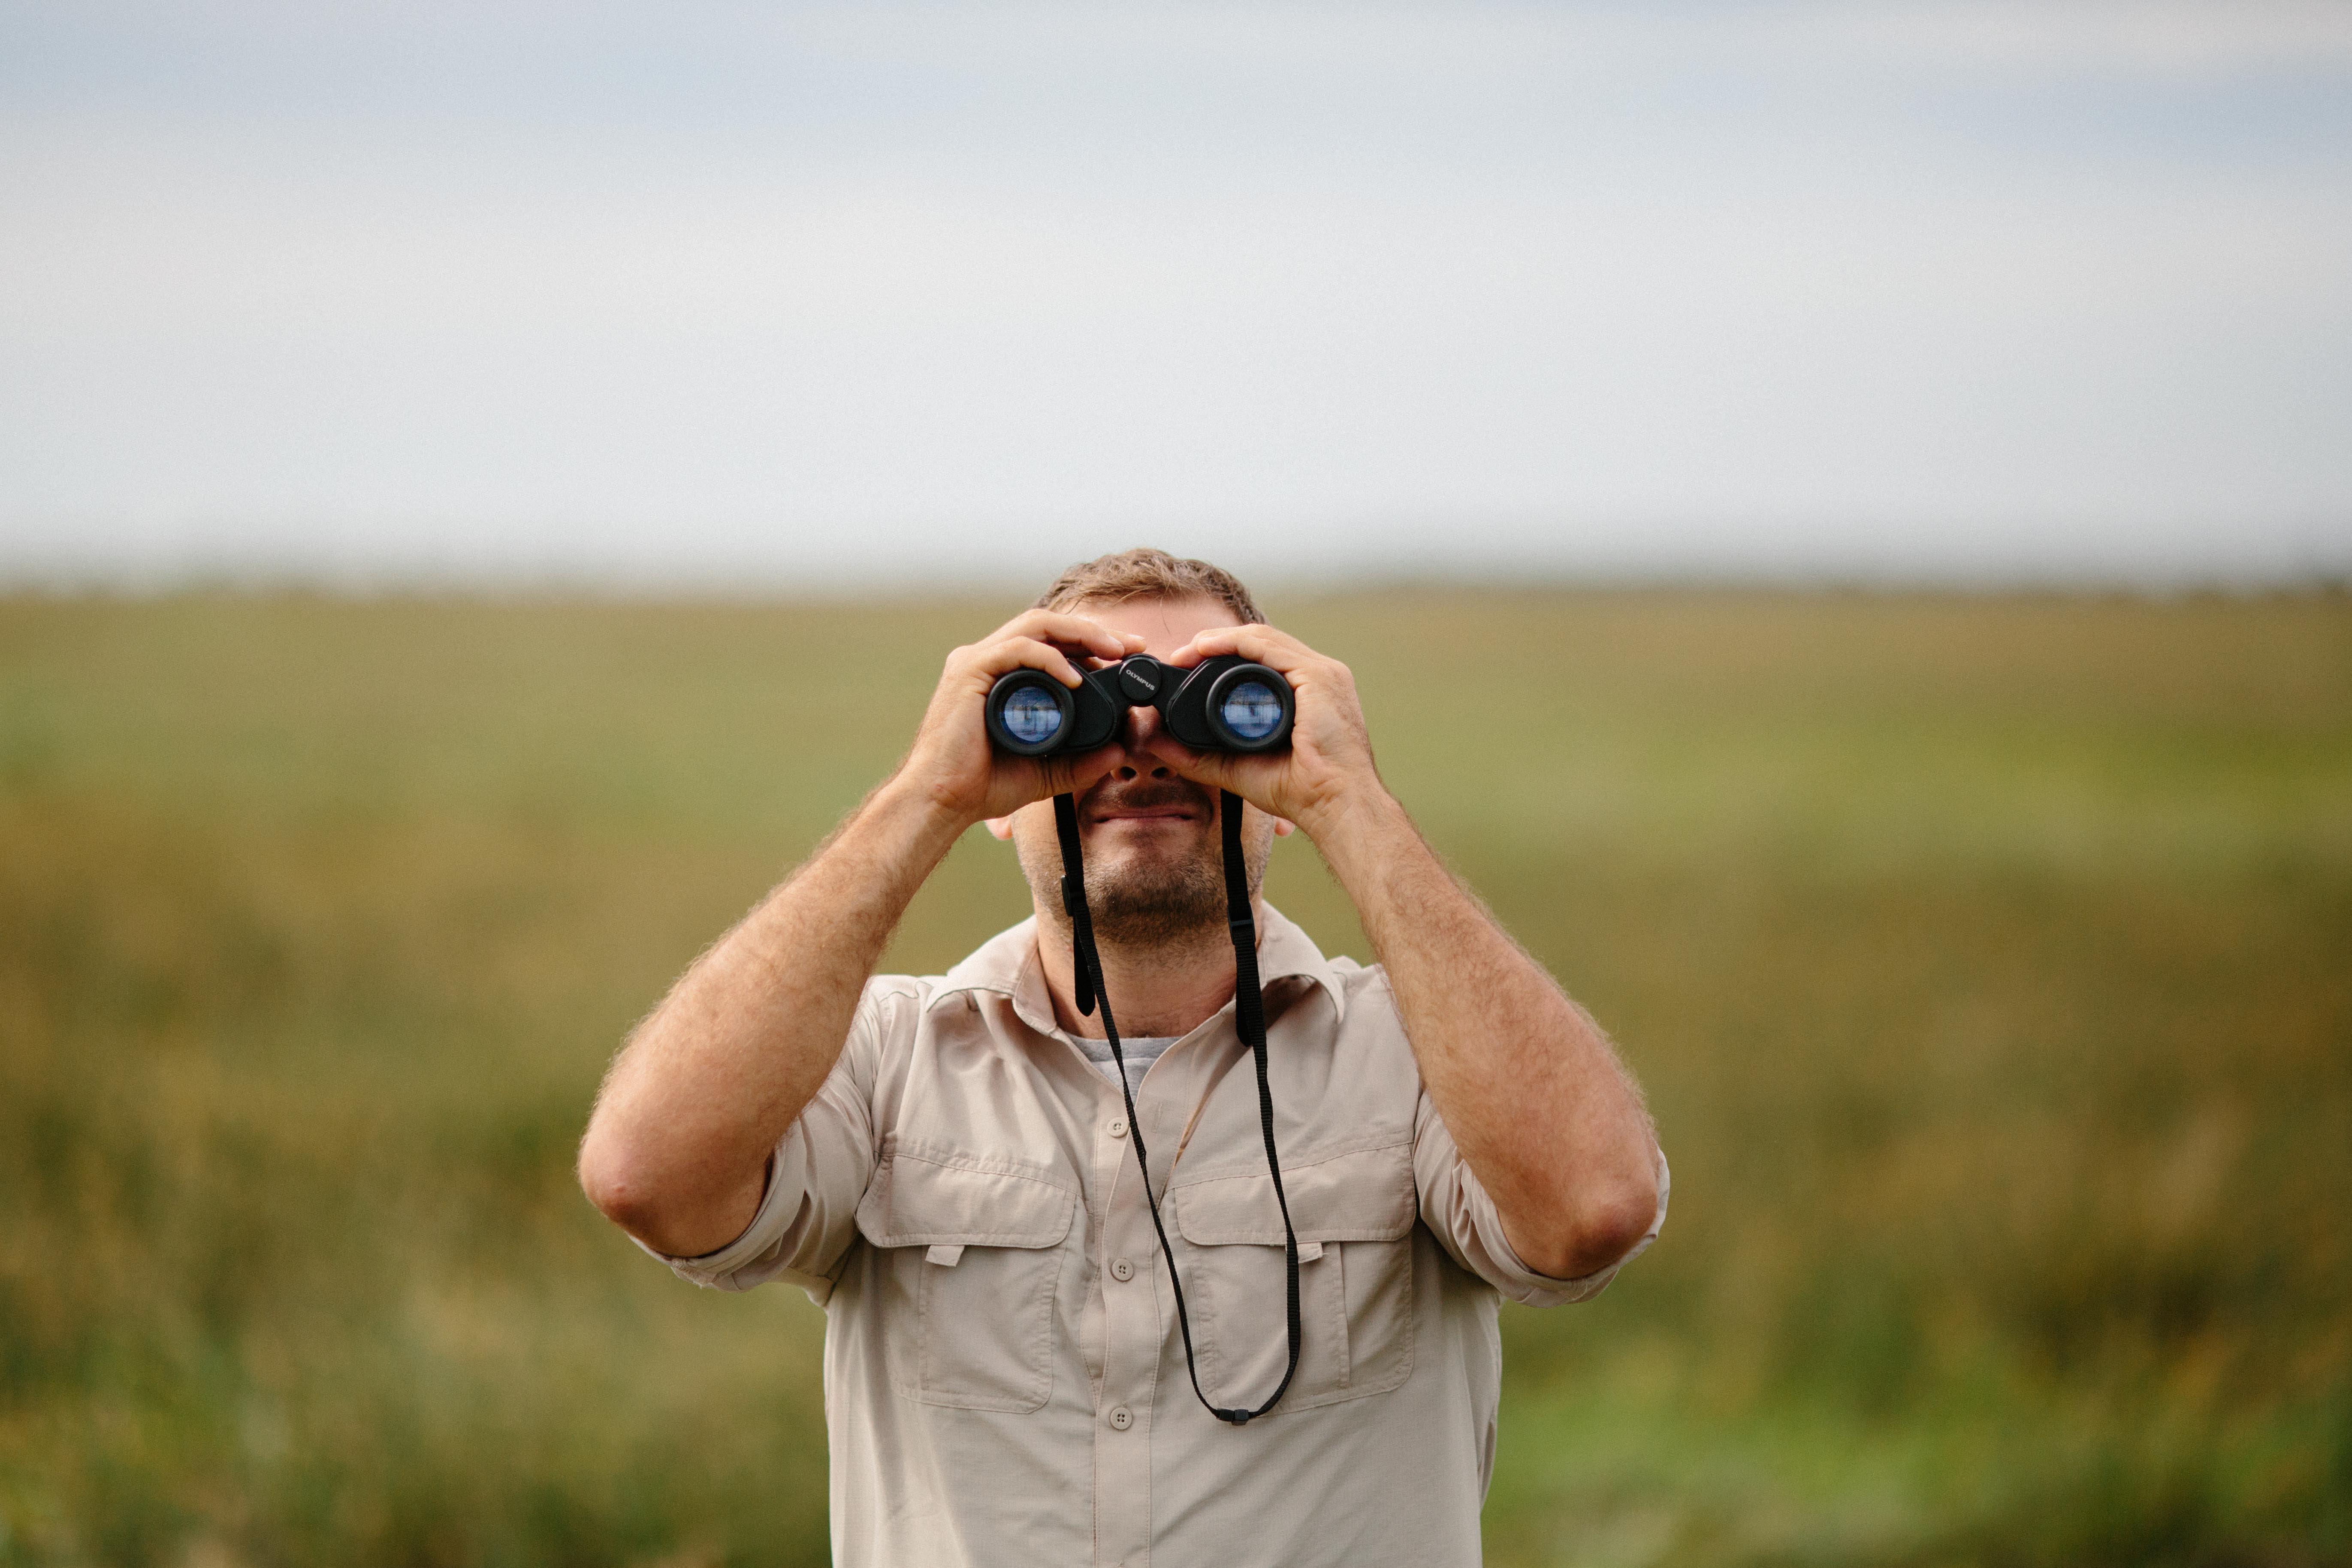 Man on a safari expedition looking through binoculars